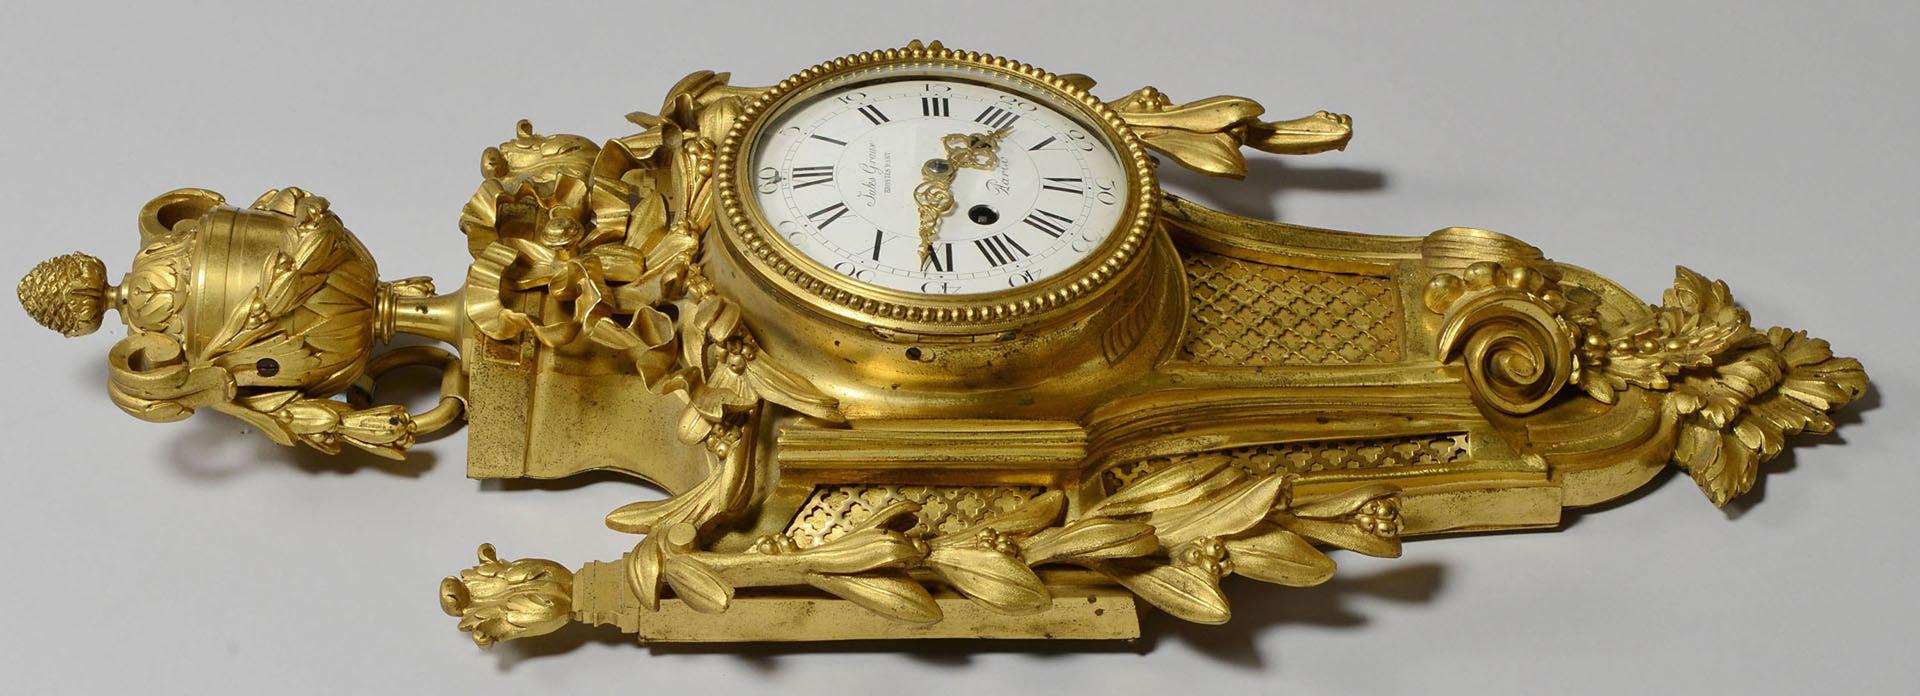 Lot 168: Jules Graux Gilt Bronze French Wall Clock